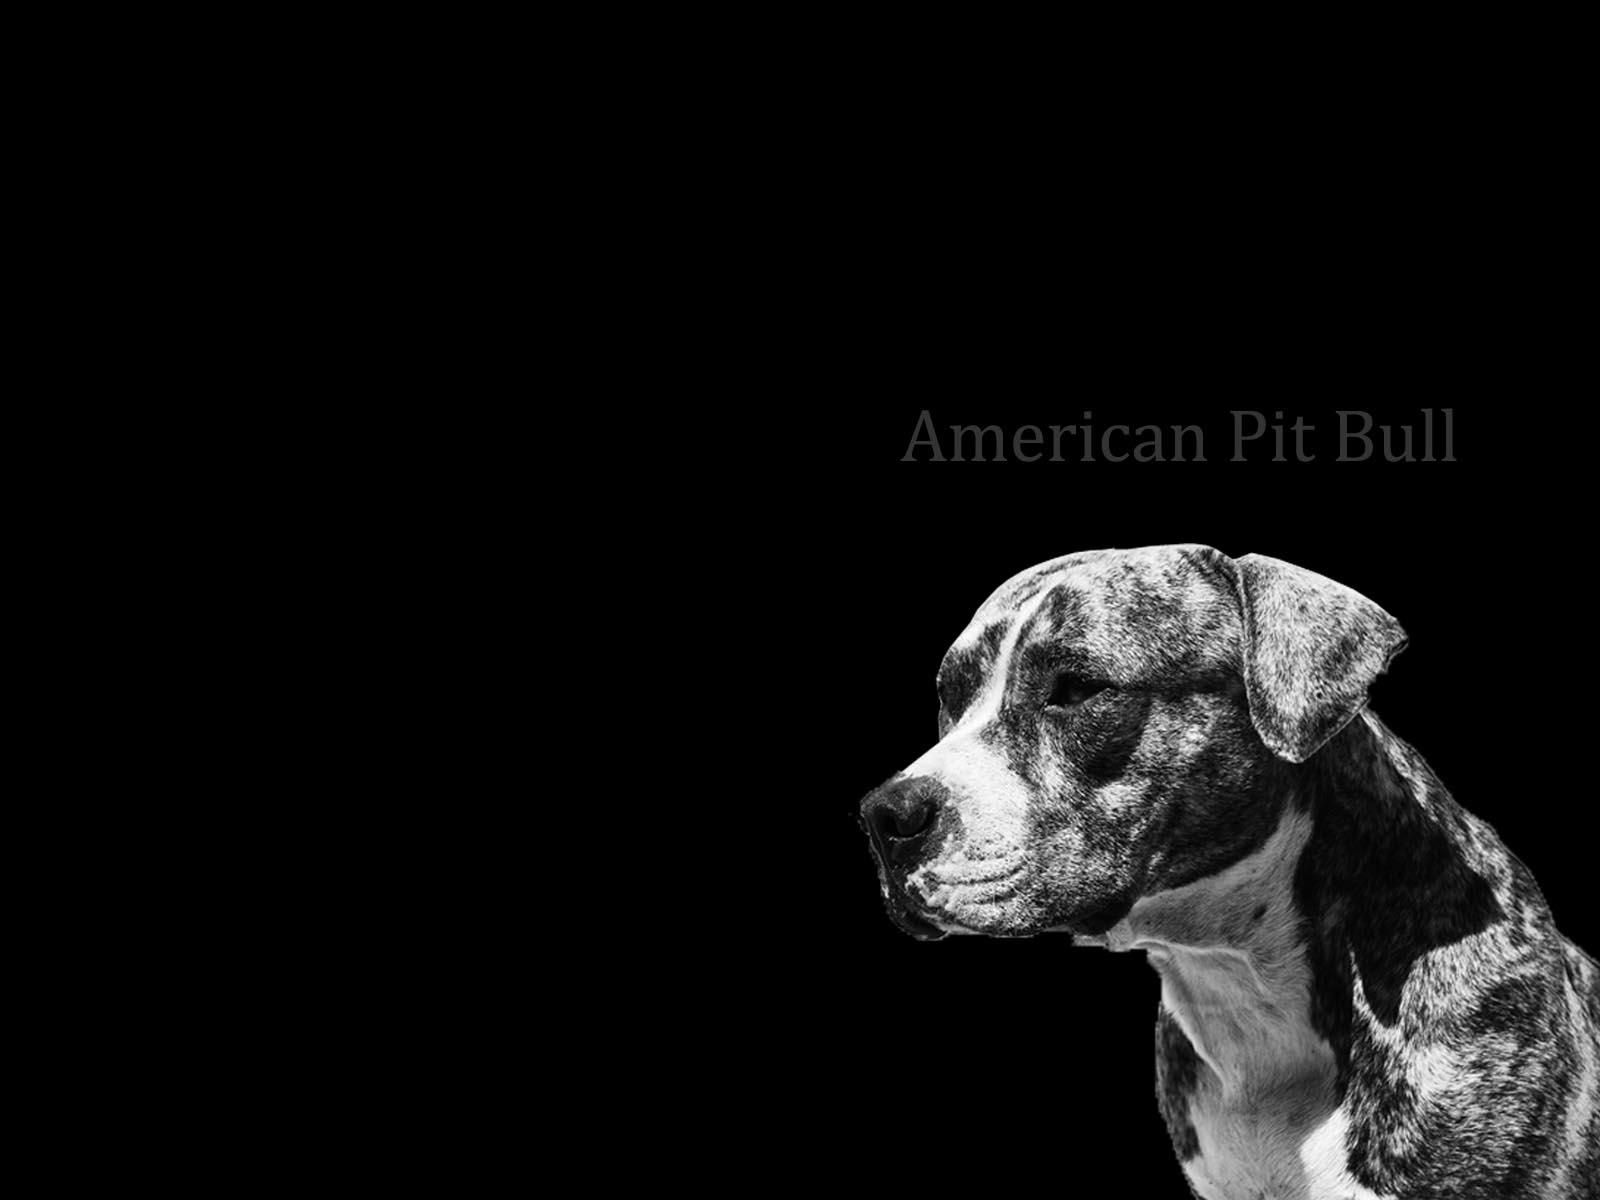 Pitbull Wallpapers 3d Pitbull Dogs Wallpapers Wallpaper Cave